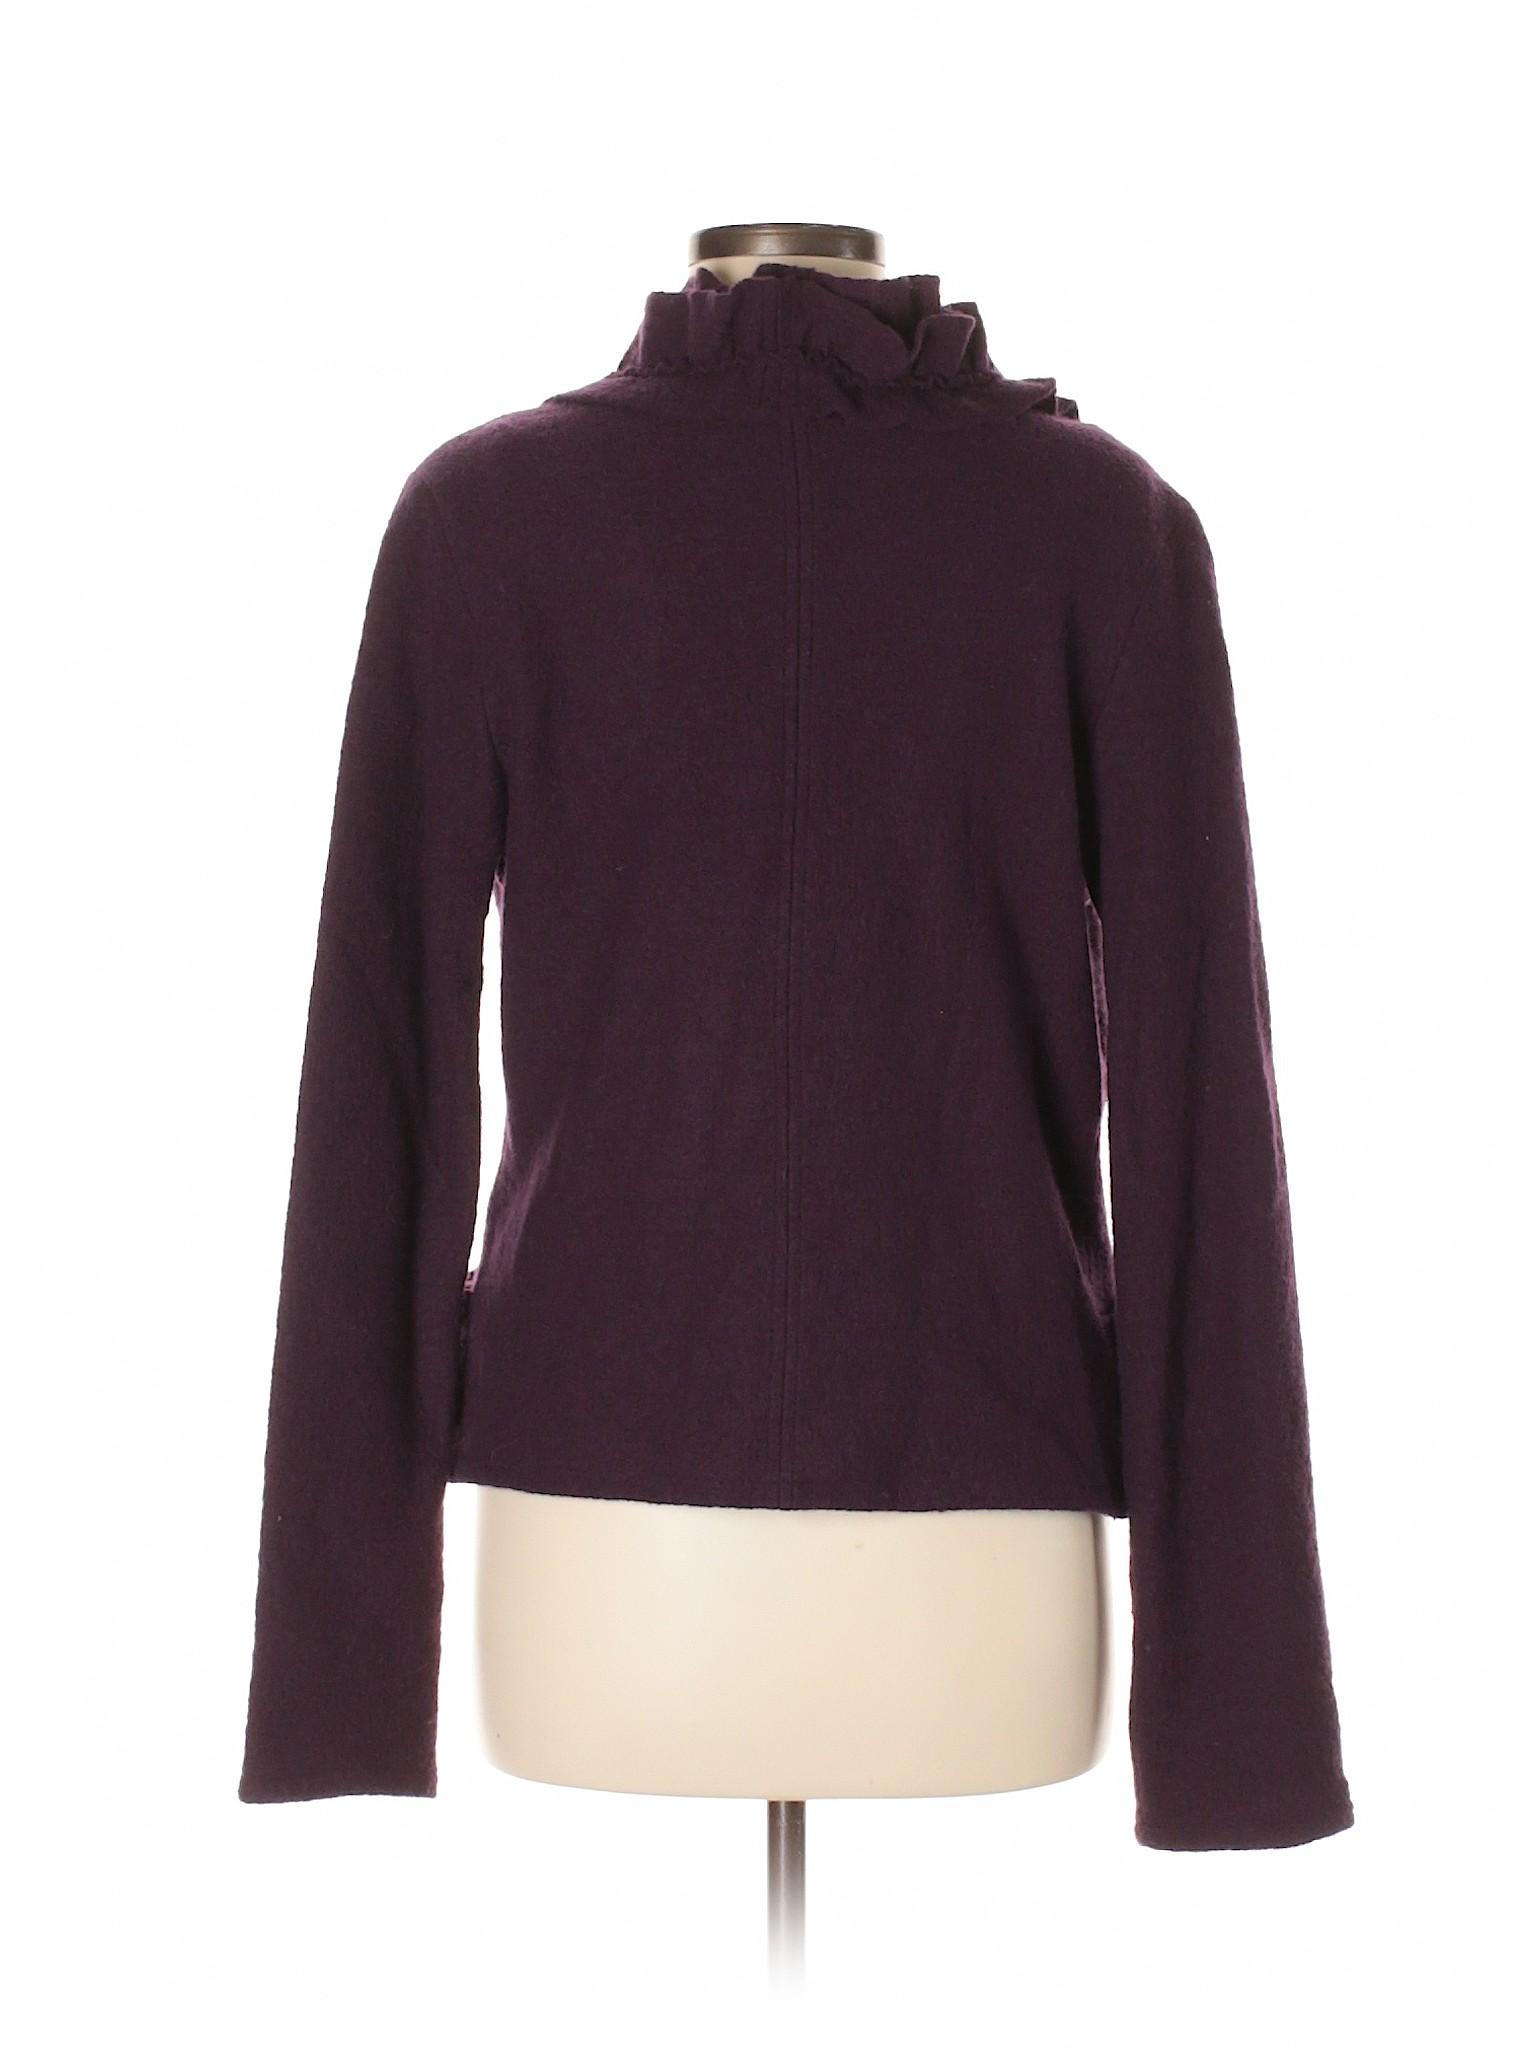 winter Boutique Cardigan Apt 9 Wool aZqd1w6qpx